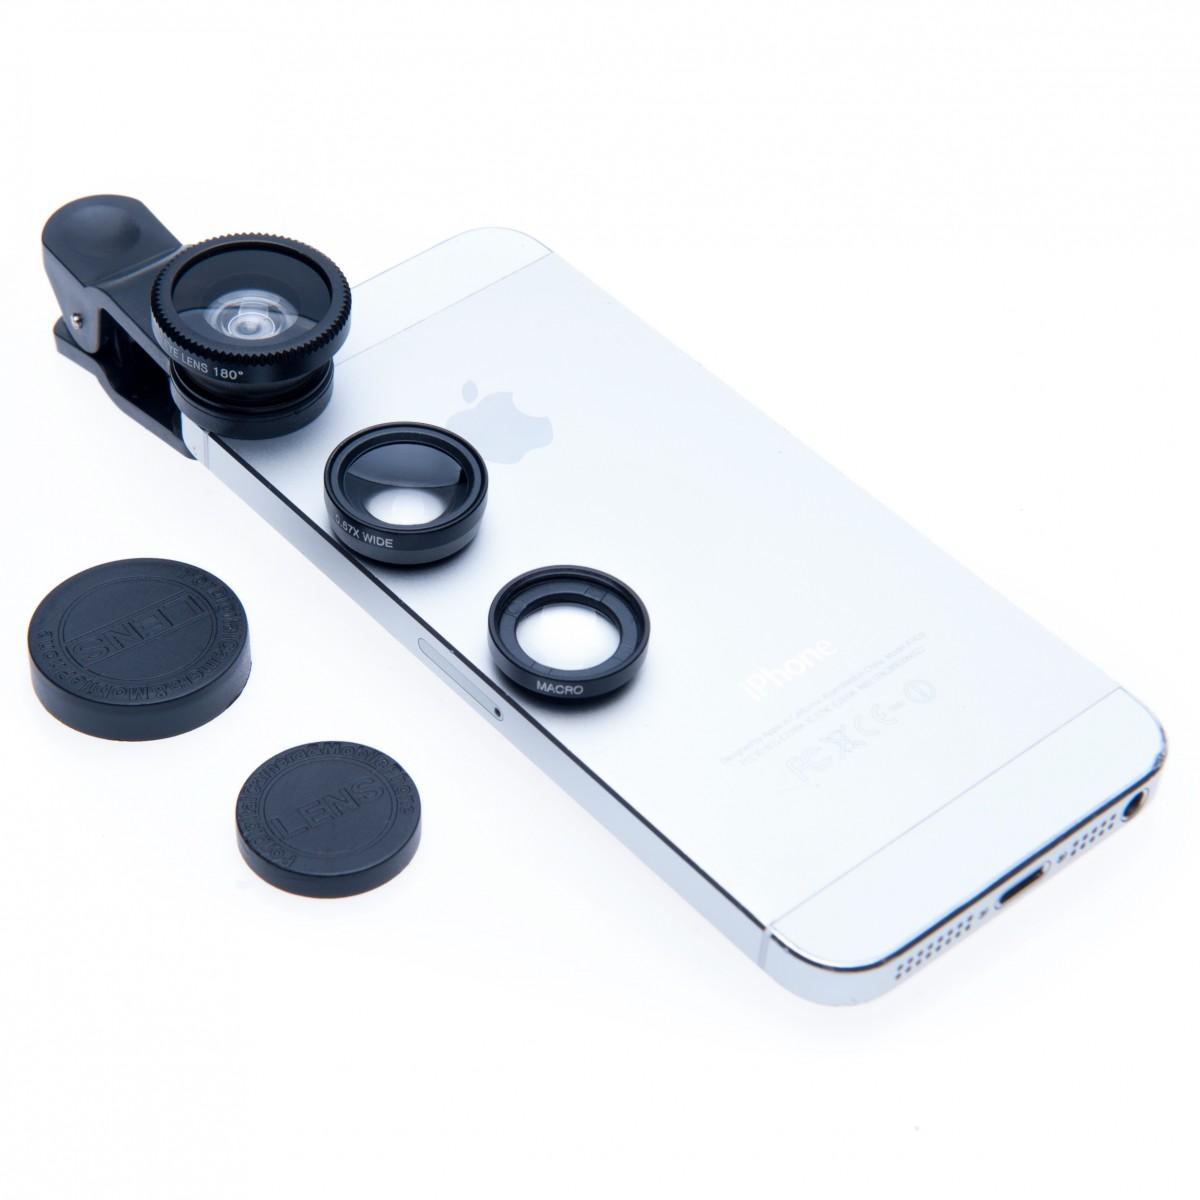 Photography Kit for Lenovo Vibe K4 Note: Phone Lens, Tripod, Selfie, stick,  Remote, Flash